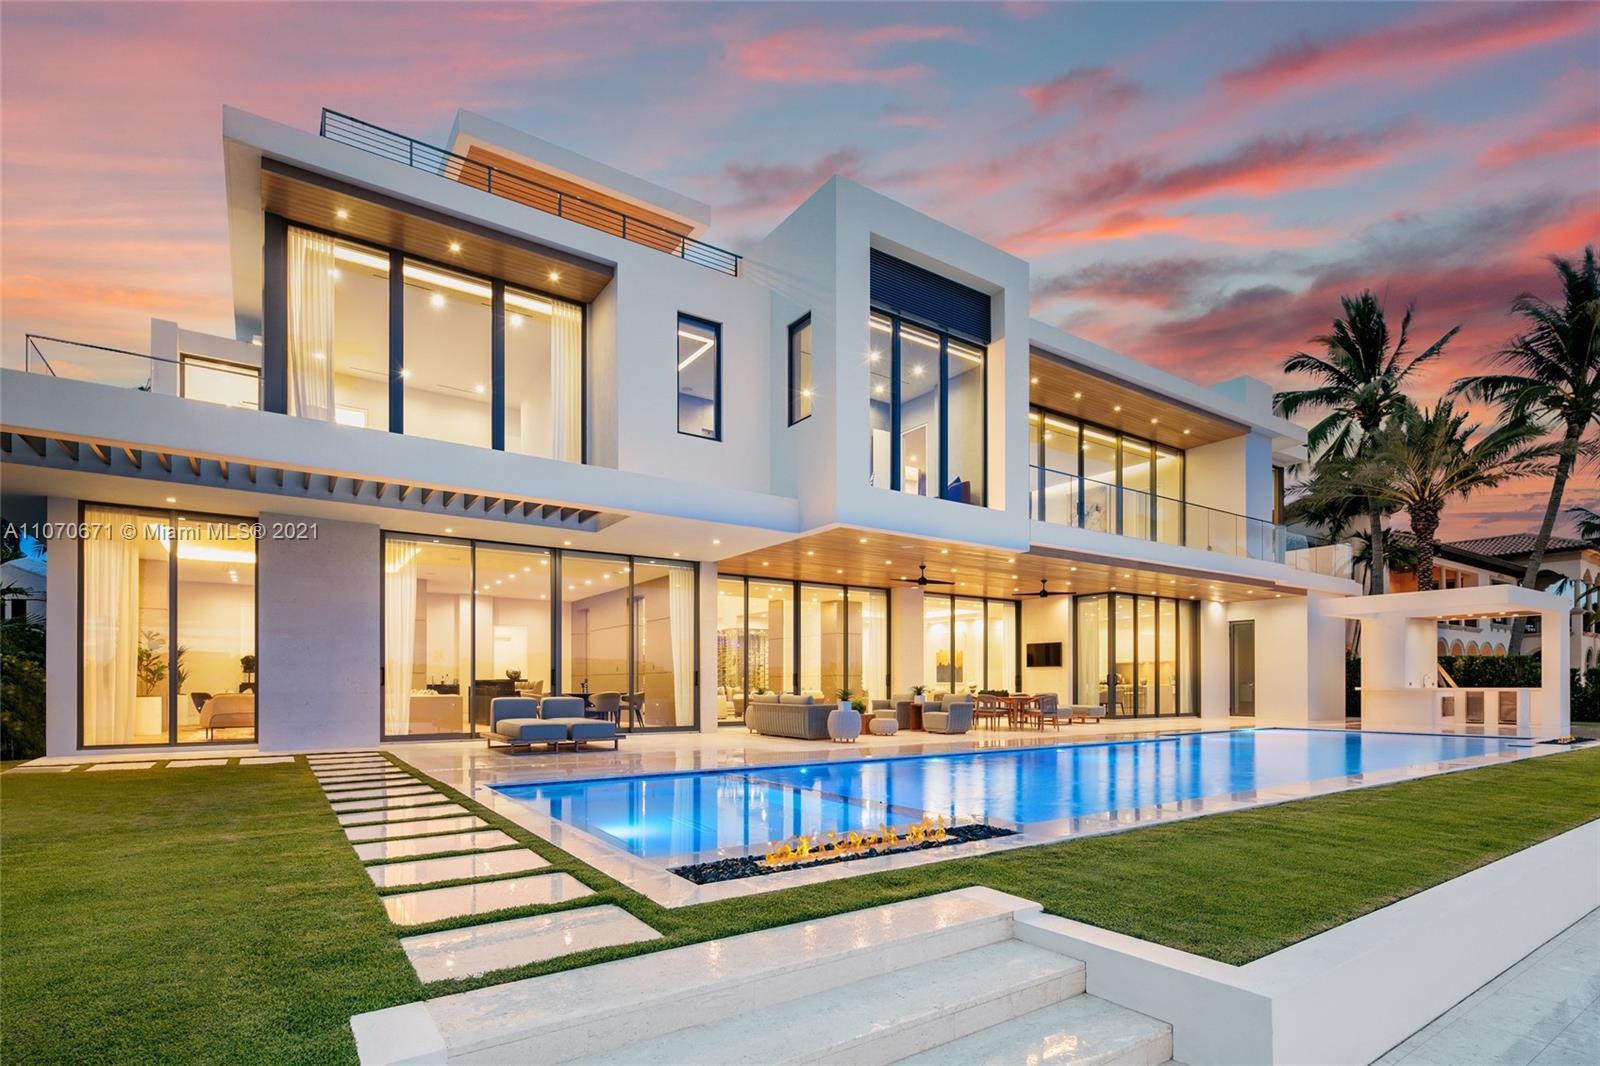 Property for sale at 2412 Laguna Dr, Fort Lauderdale,  Florida 33316